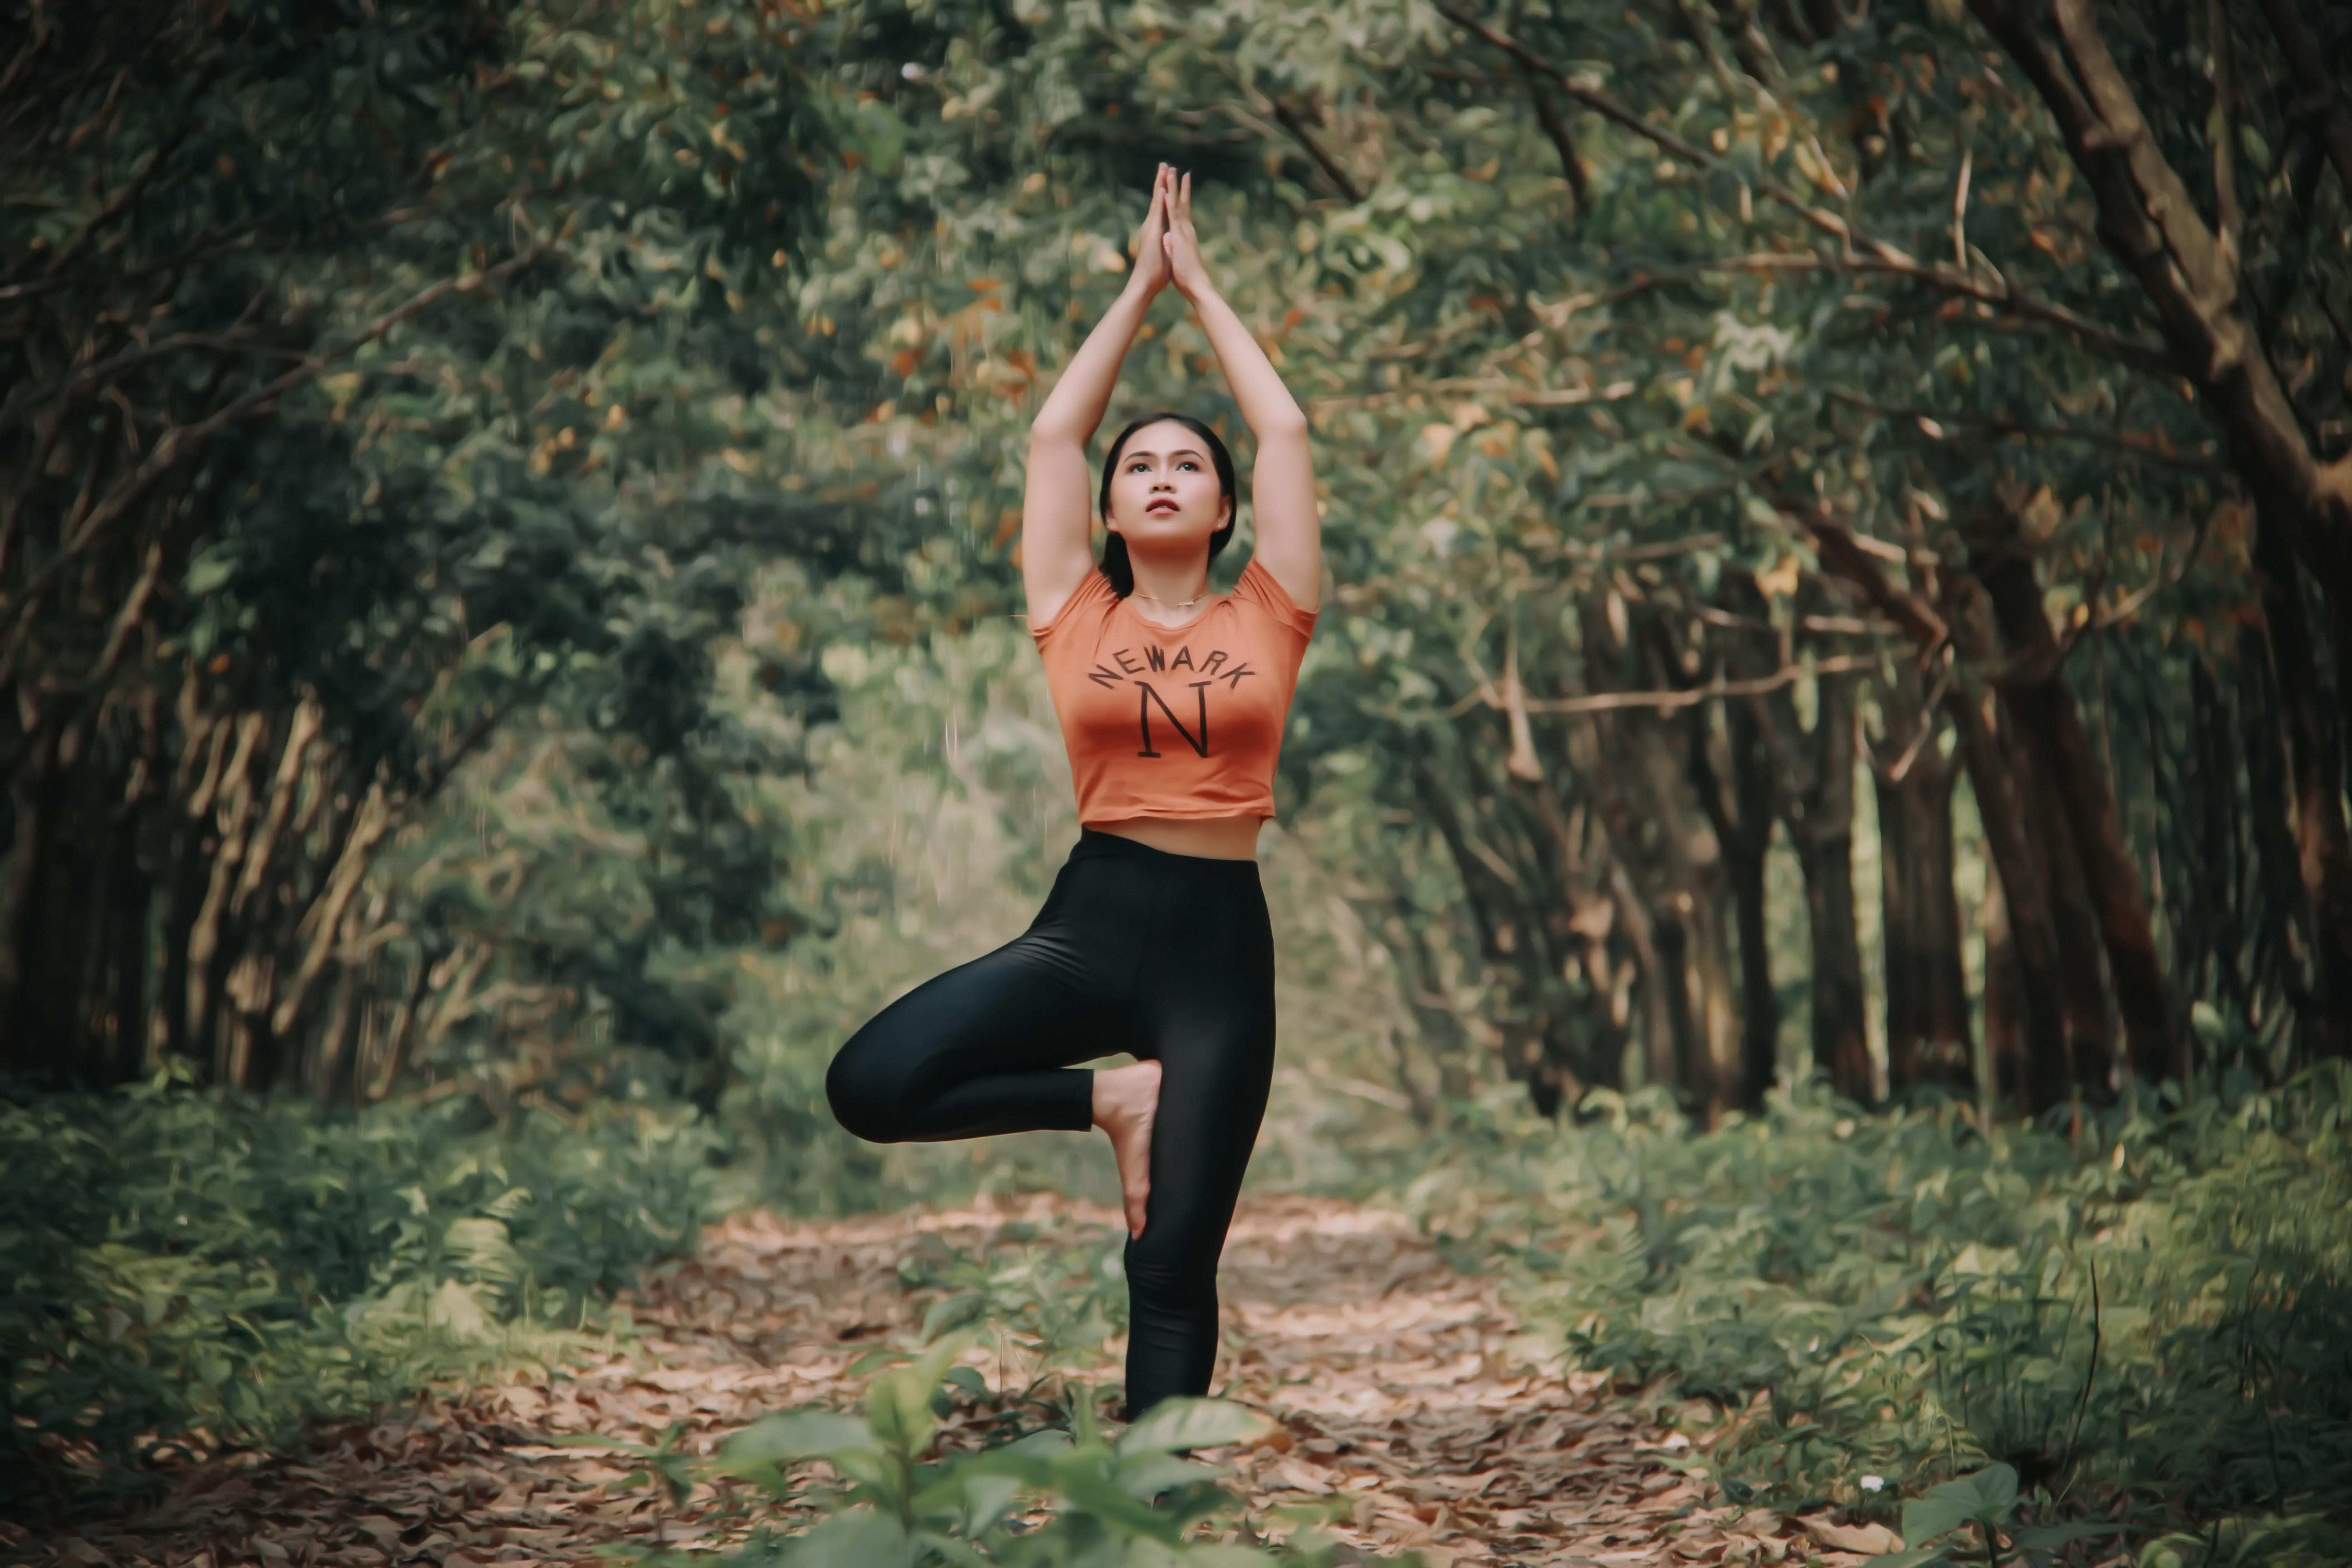 Endocannabinoid system creates balance